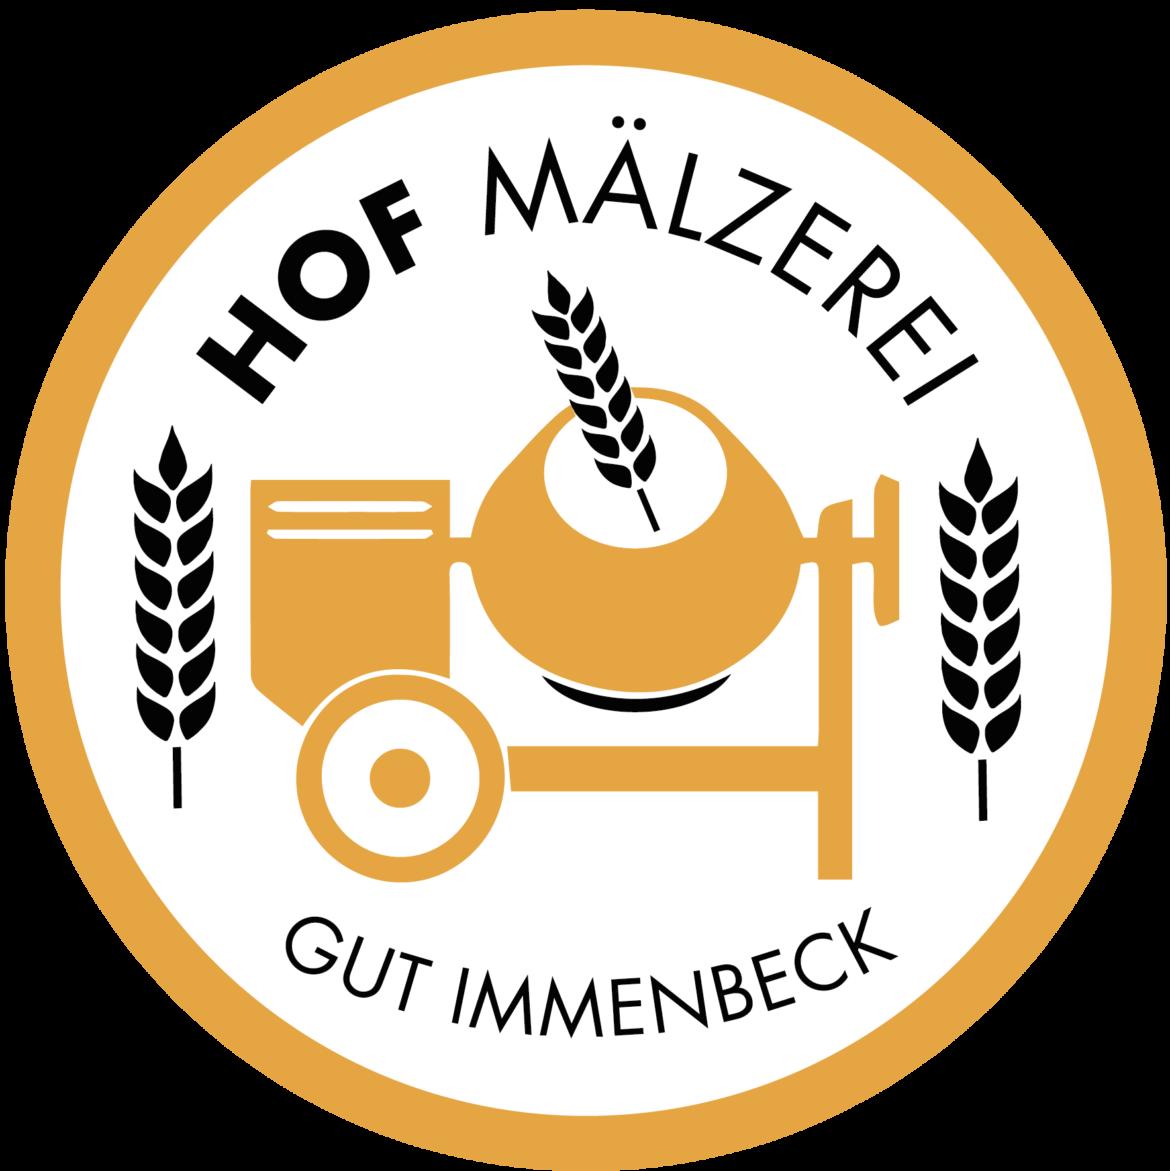 Logos-Hofmälzerei_Kreis_bunt_2.png